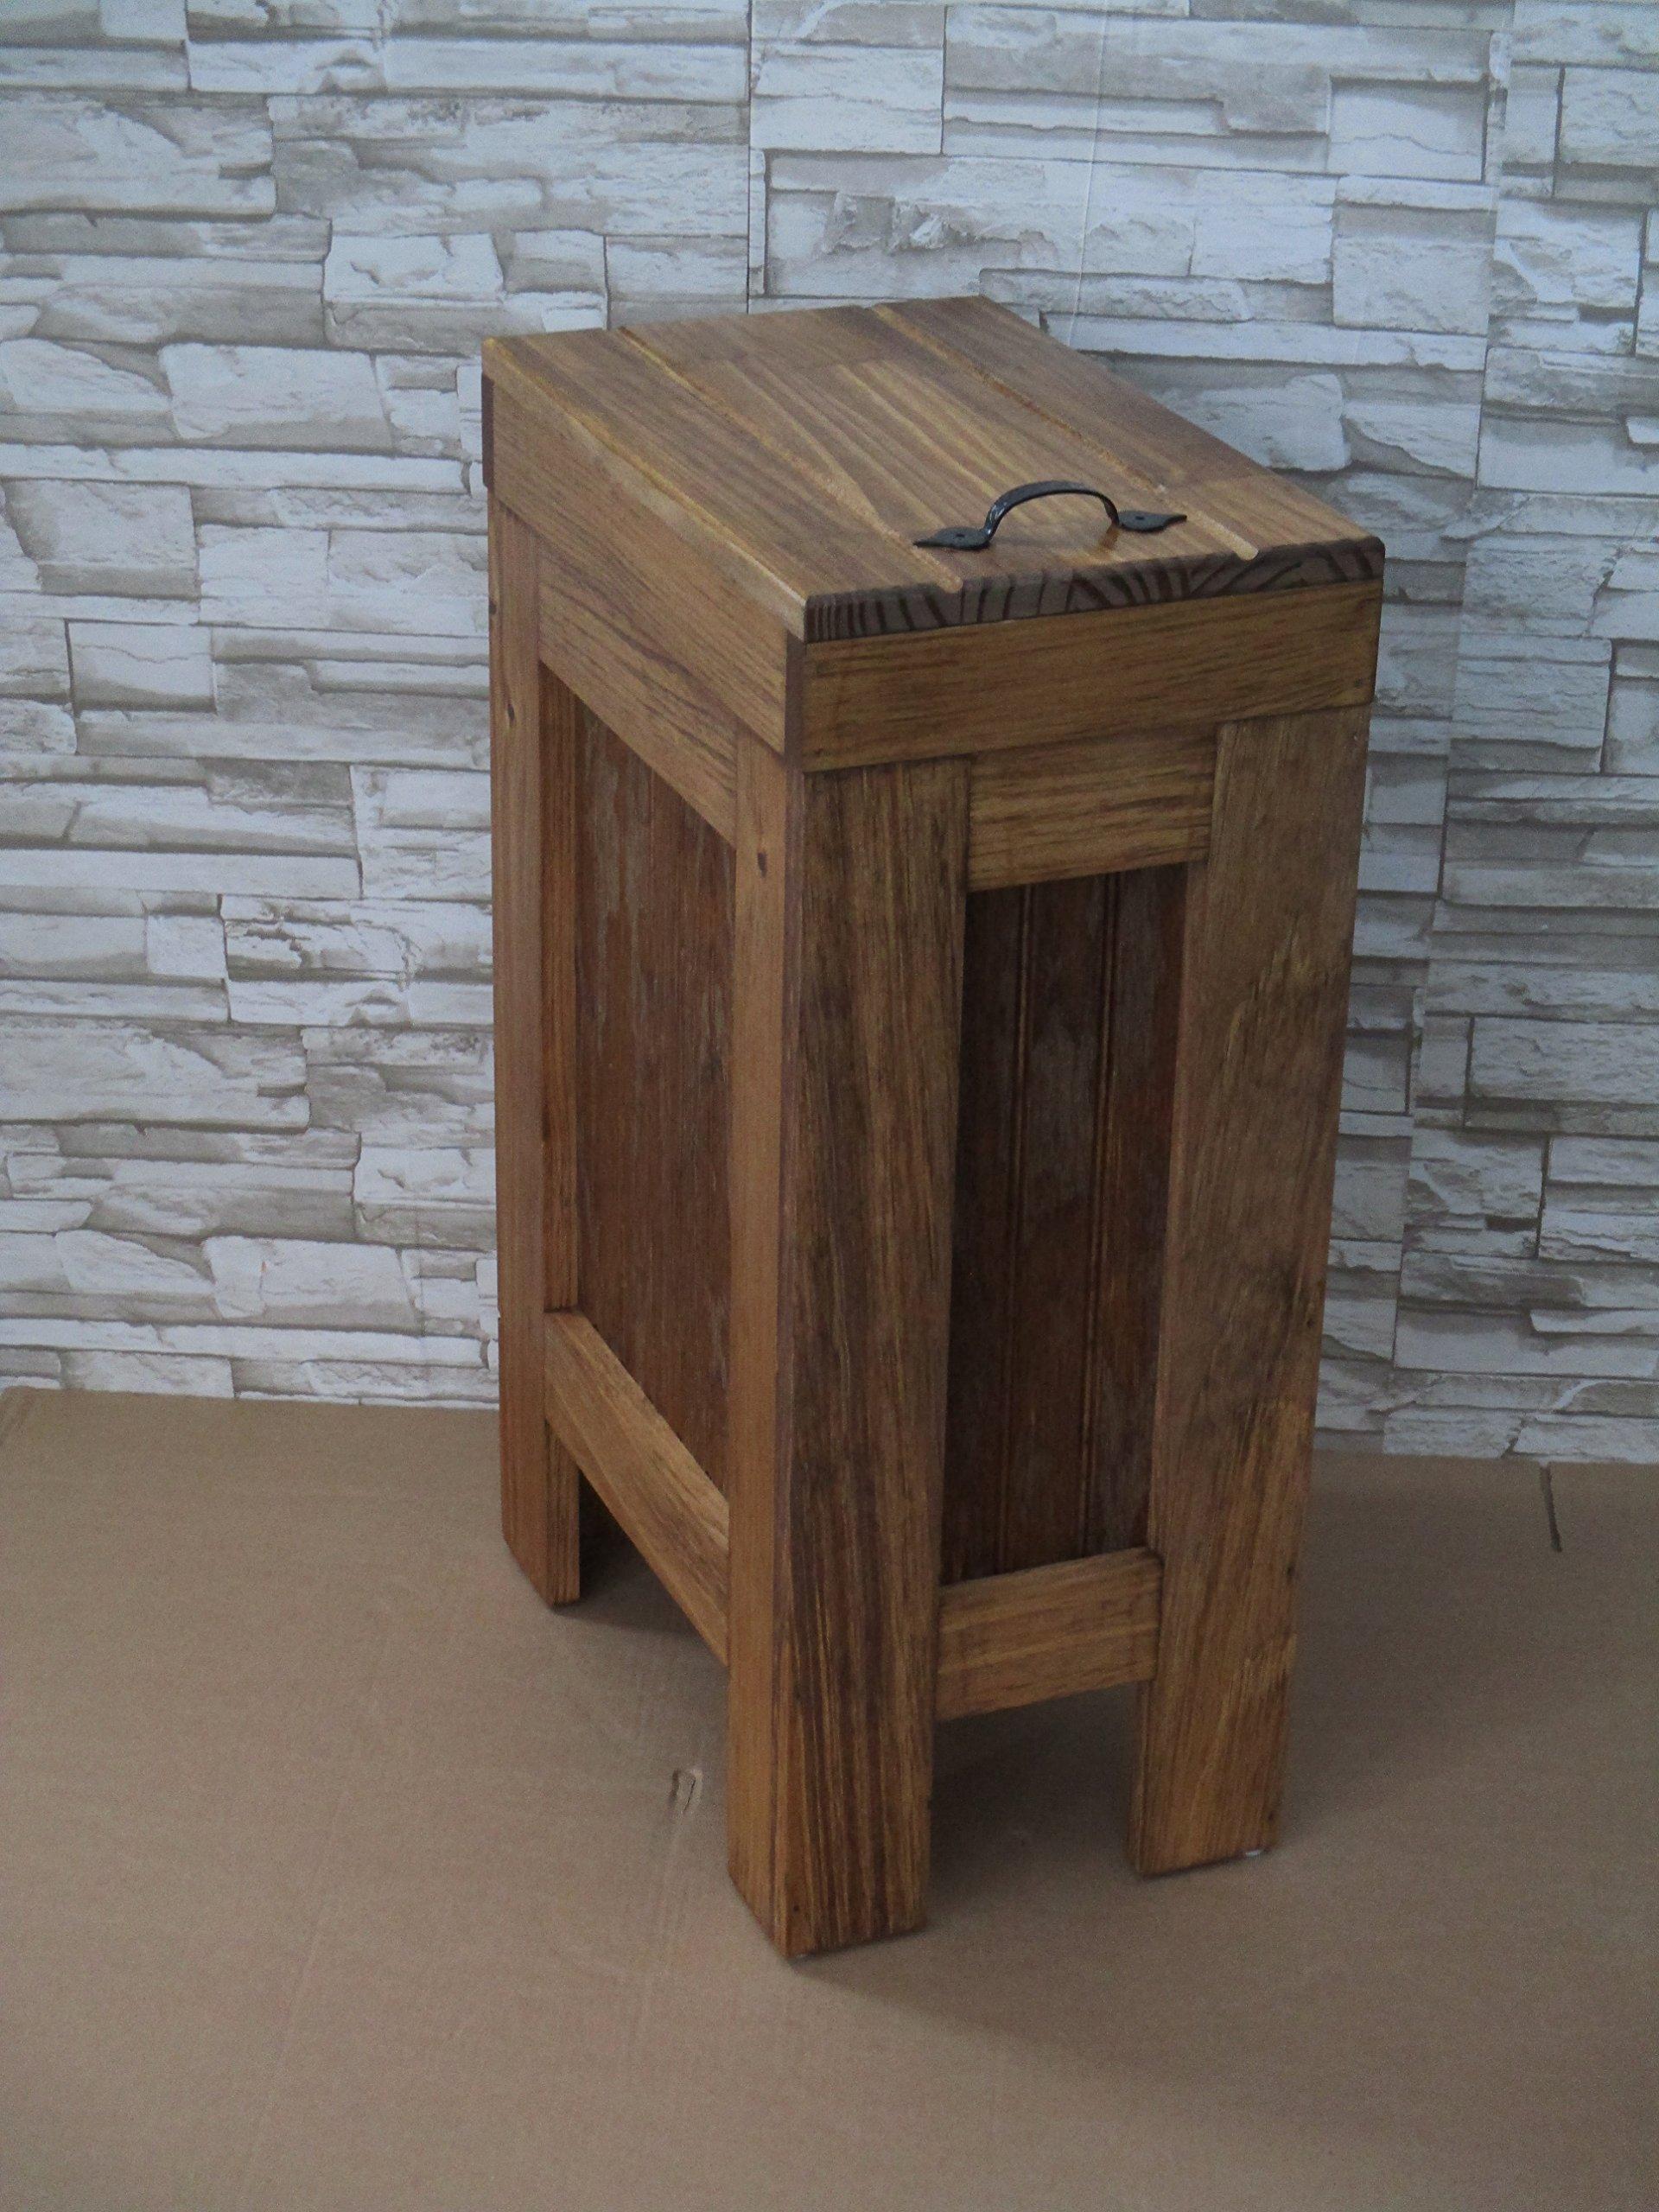 Wood Wooden Trash Bin Kitchen Garbage Can 13 Gallon , Recycle Bin, Dog Food Storage , Early American Stain - Rustic Pine - Metal Handle - Handmade in USA By Buffalowoodshop